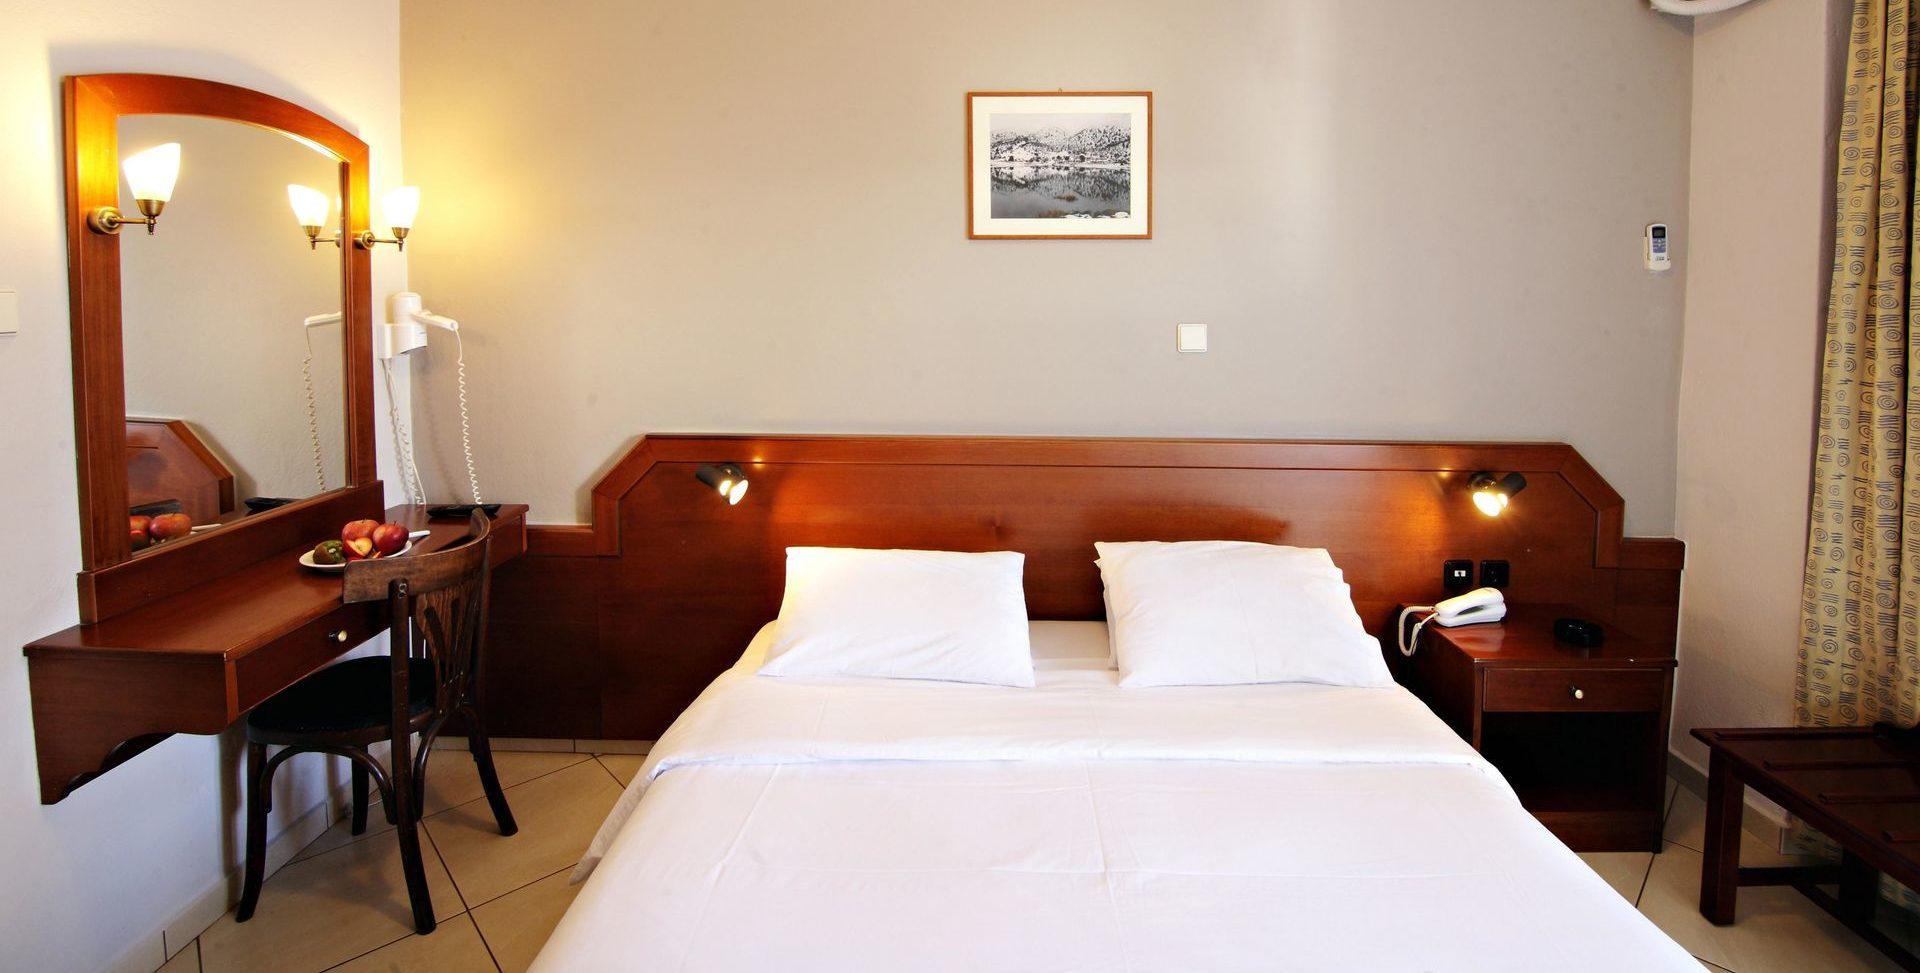 Economy Double Room Bed Arkadi Hotel Chania city center Crete